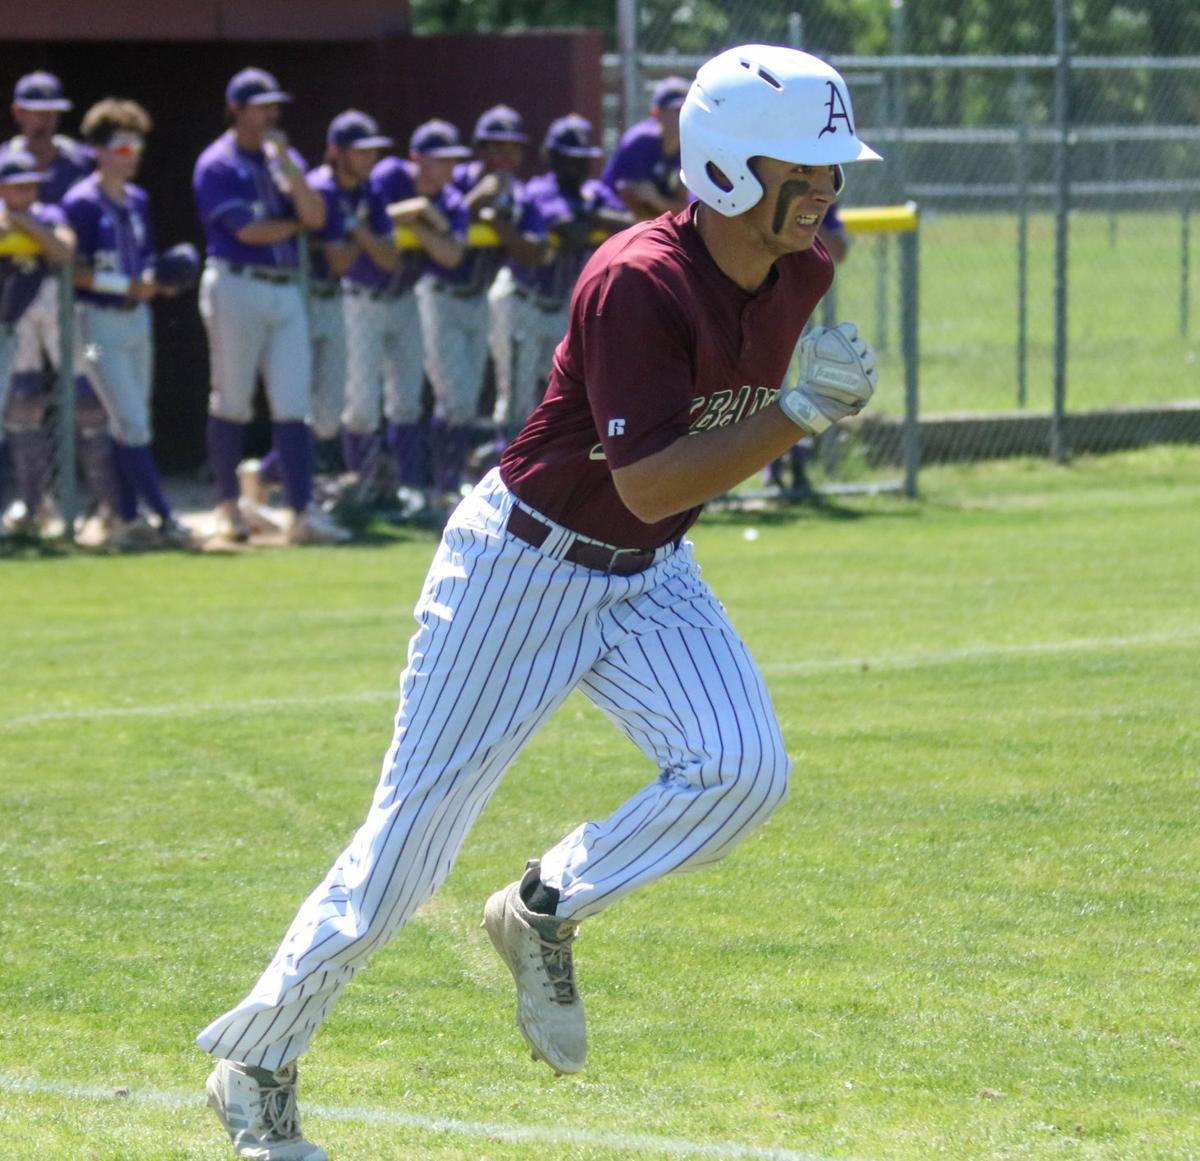 Albany vs Iowa baseball: Brock Bennett